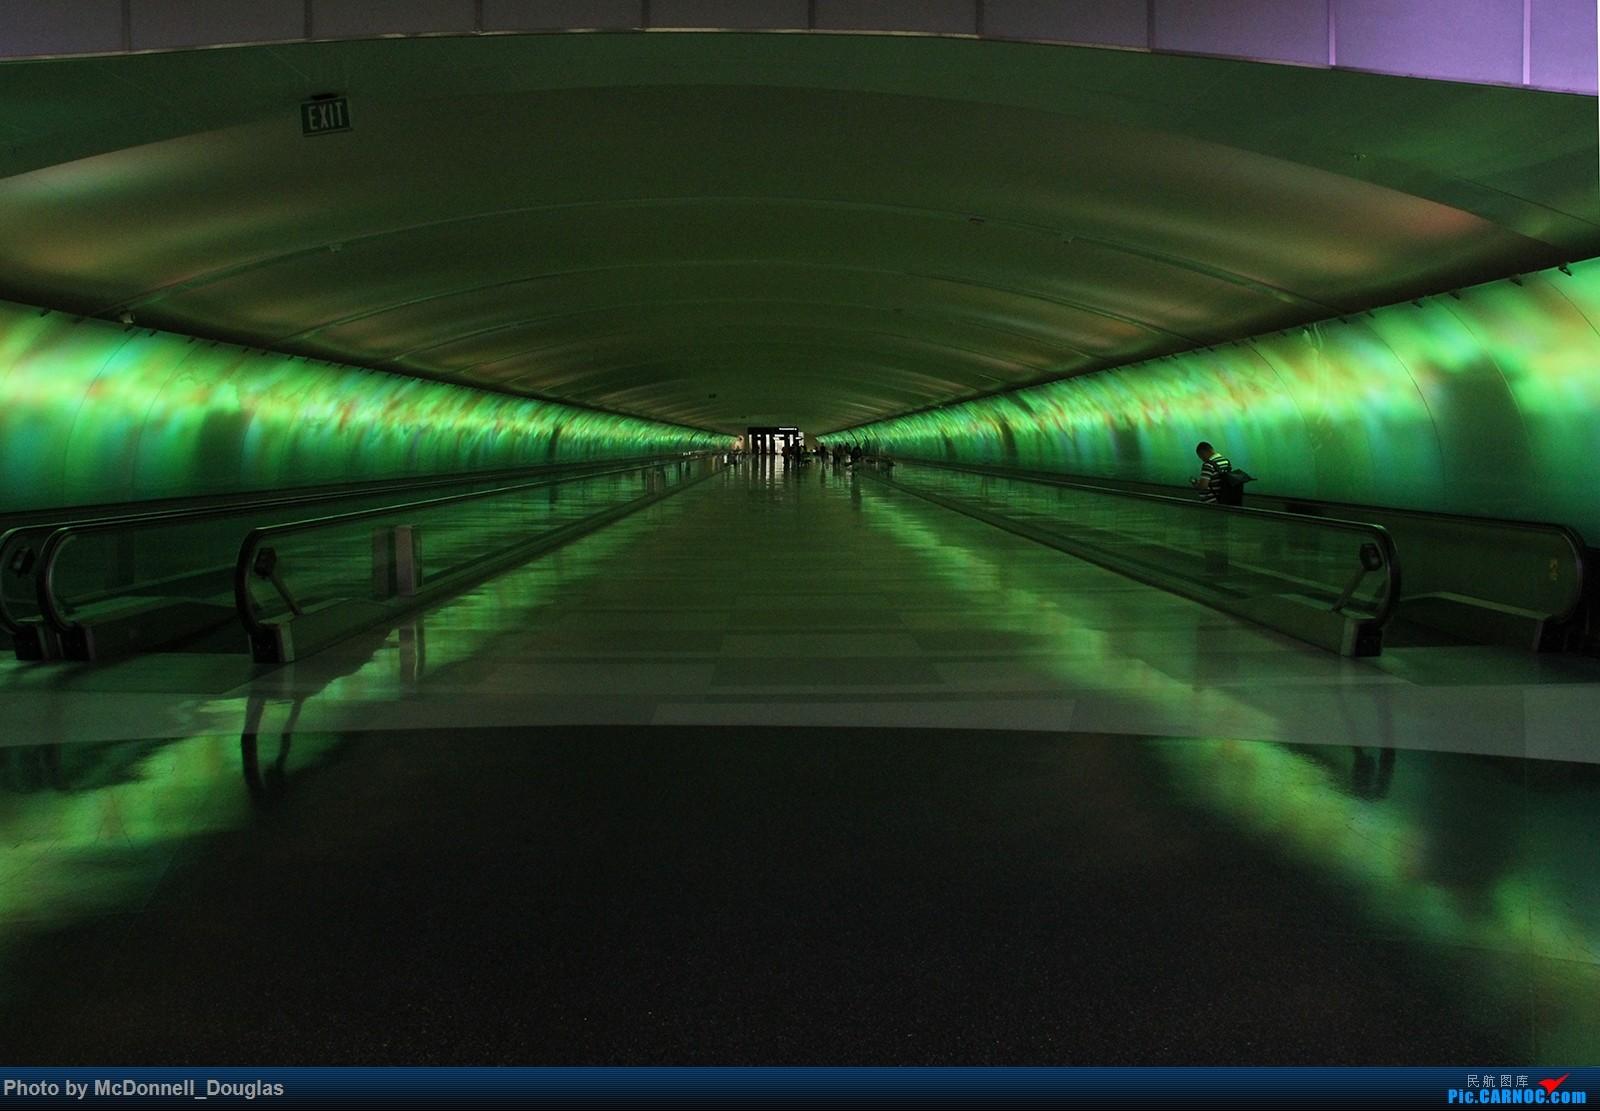 Re:[原创]【上海飞友会】图会很多,也有很多驾驶舱,杂七杂八的美帝,梦寐以求的圣马丁,这更绝不弃贴,前十个id砸飞机砸一个返一个【驾驶舱已出现】    美国底特律都会韦恩郡机场